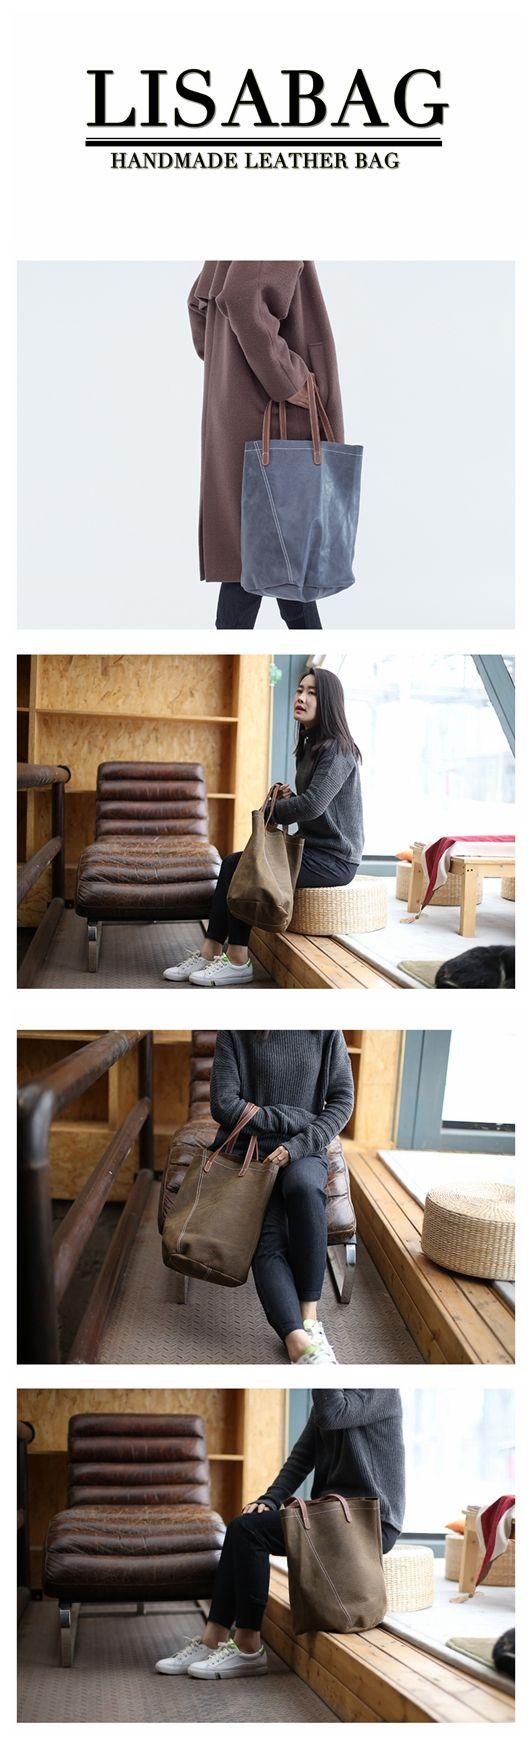 ... Bag Leather Tote Bag Basket Storage Gift for  the best attitude 7a343  42425 Handmade Womens Fashion Leather Tote Bag Handbag Shoulder Bag Shopping  ... 330d5936fe